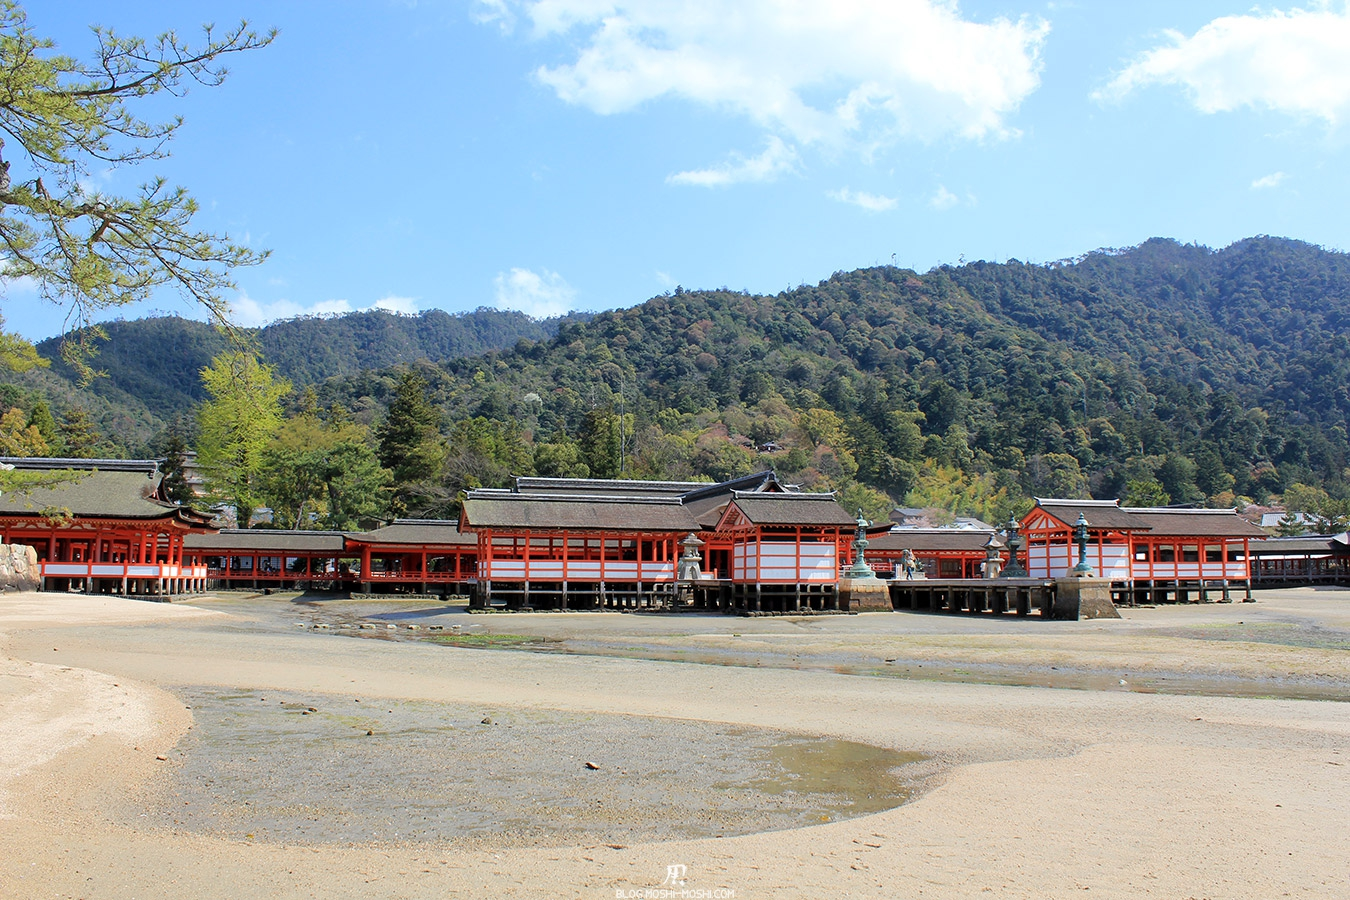 miyajima-hiroshima-saison-sakura-maree-basse-sanctuaire-Itsukushima